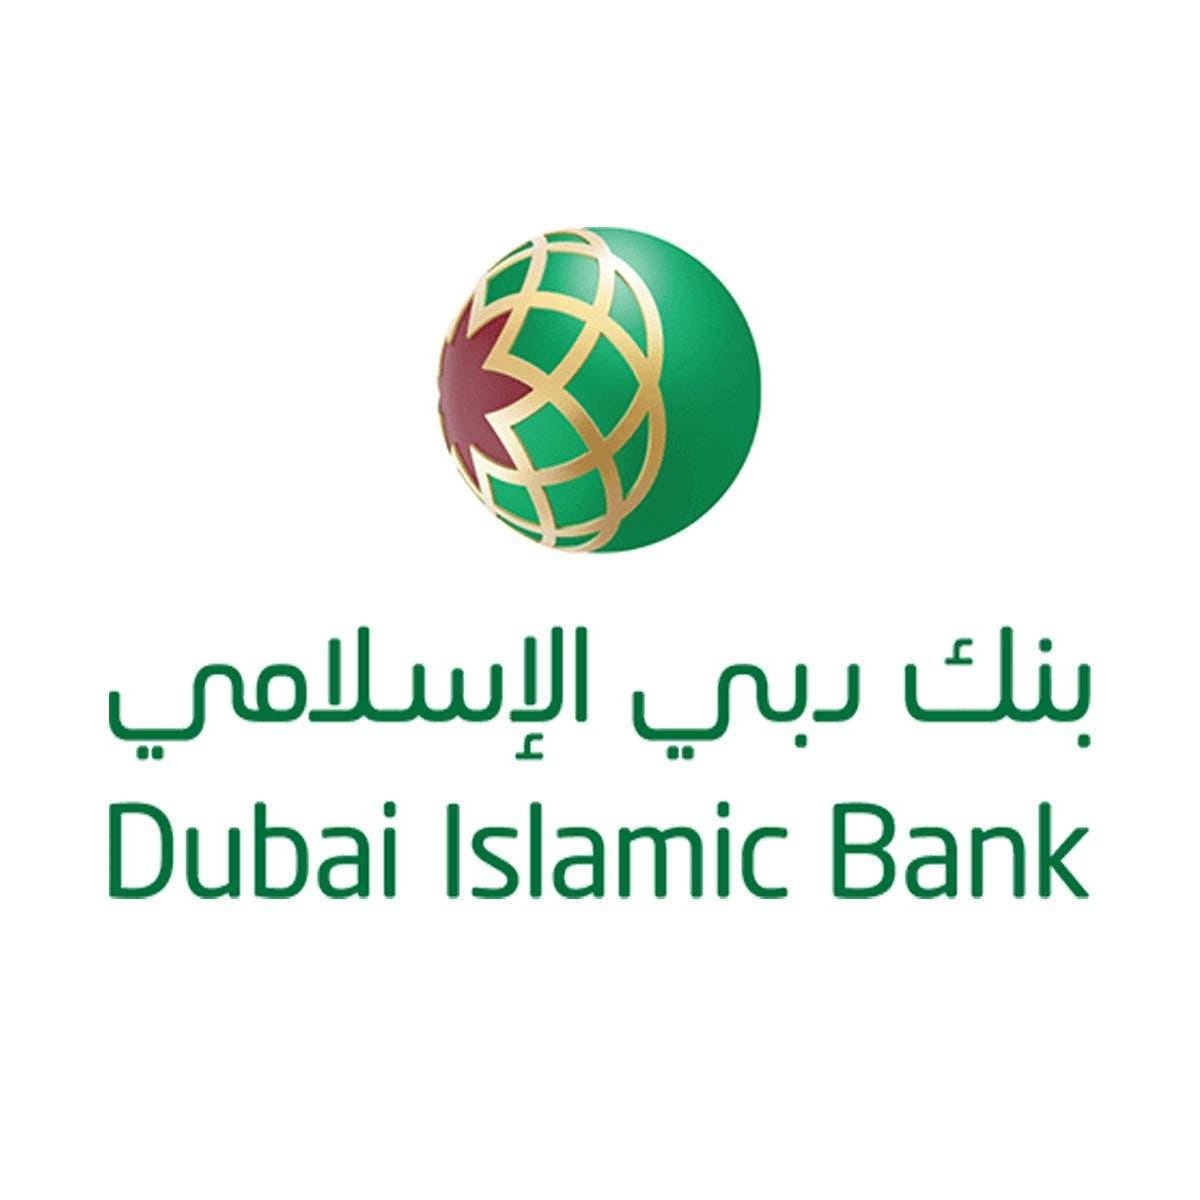 دبي الإسلامي يعتزم طرح صكوك بـ 500 مليون دولار